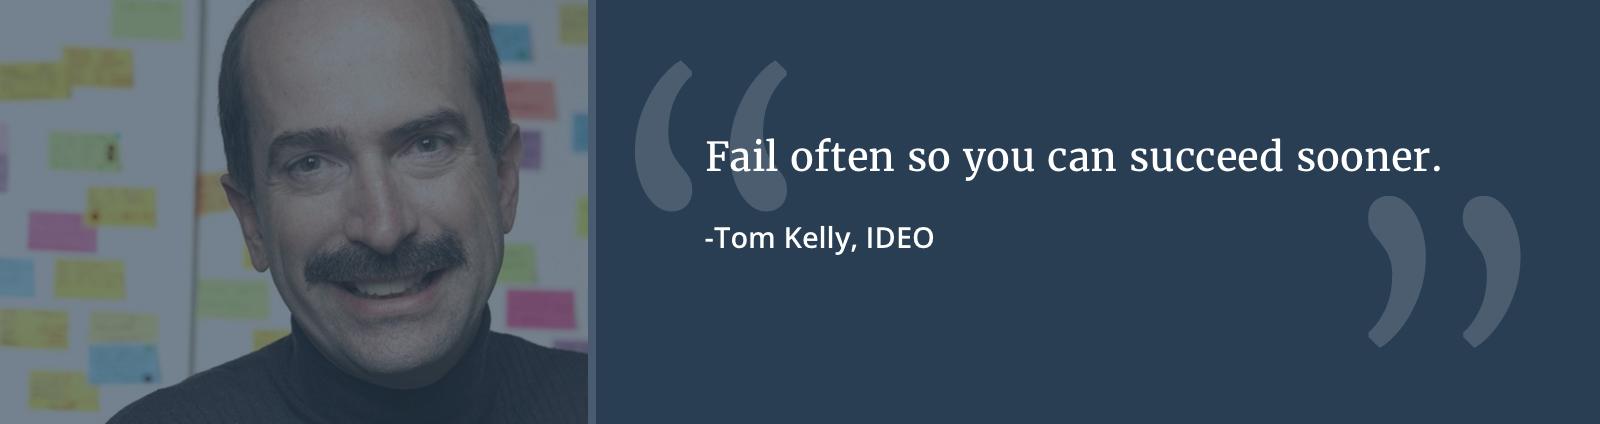 block quote 4 - Expert Blog: Improving the Customer Journey Using Design Thinking